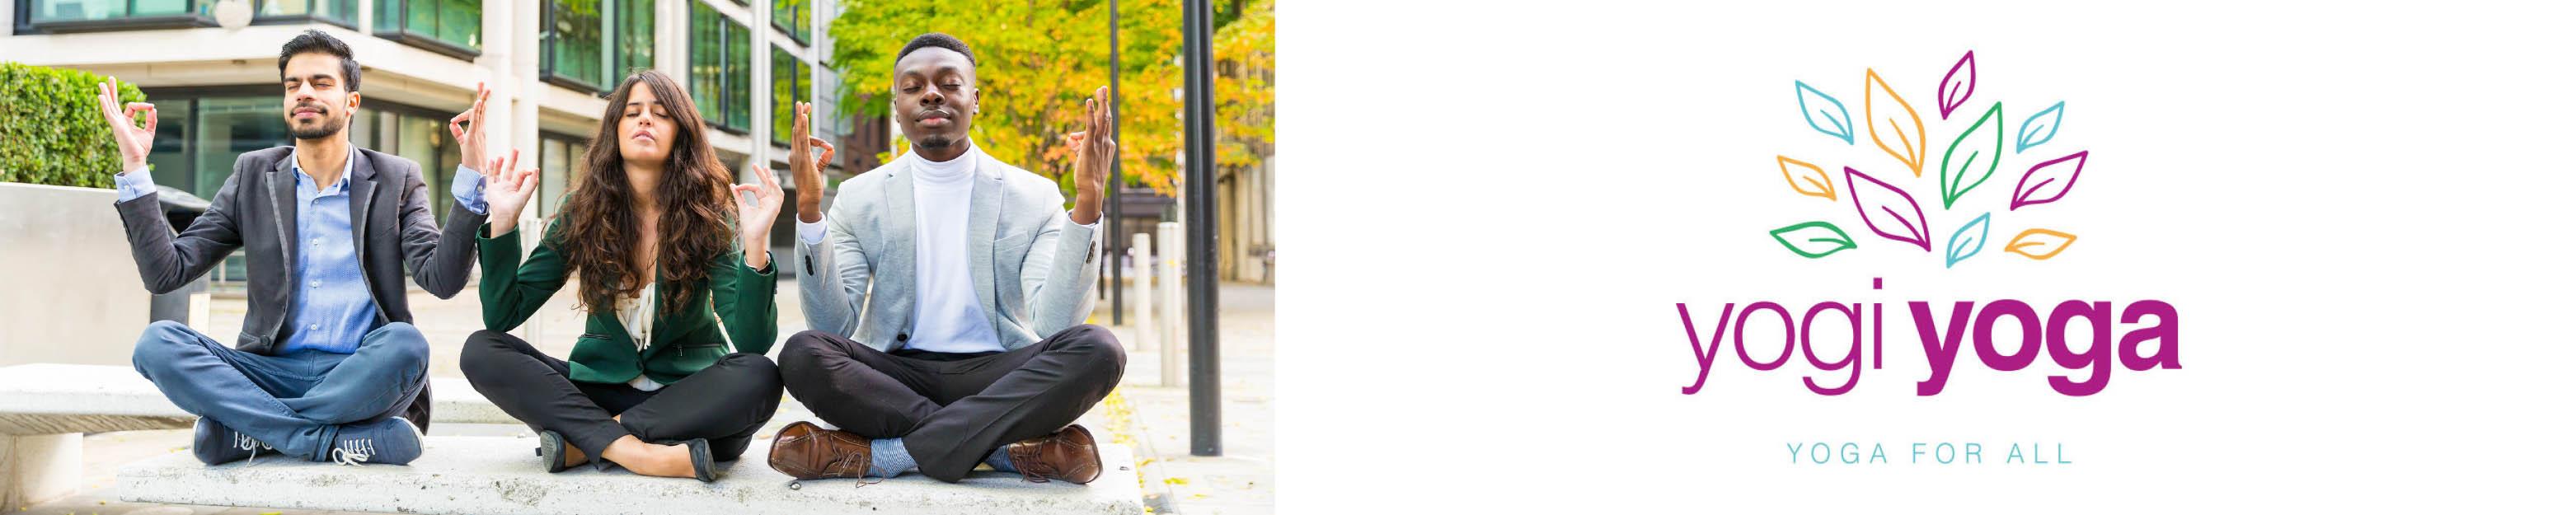 yogiyoga corporate yoga & pilates